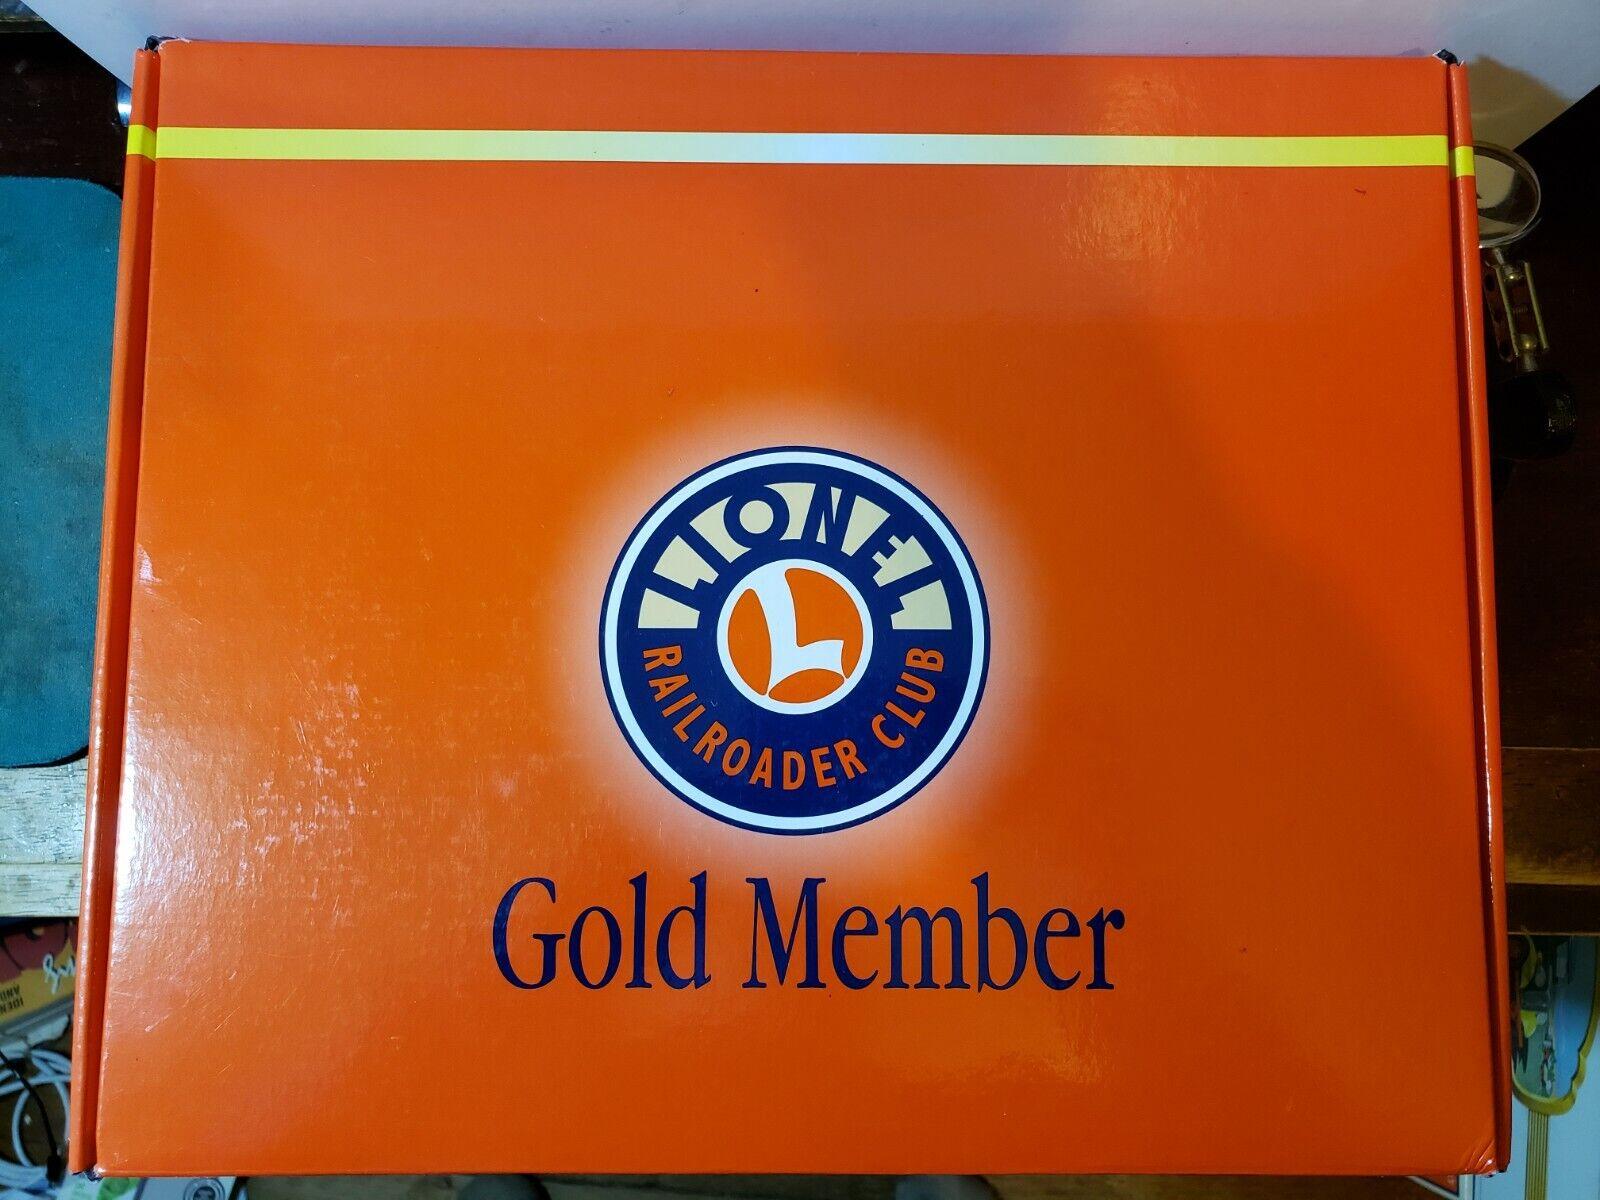 Lionel RR Club Gold Member Boxcar Set 0 - 027 Scale  2 6-19978